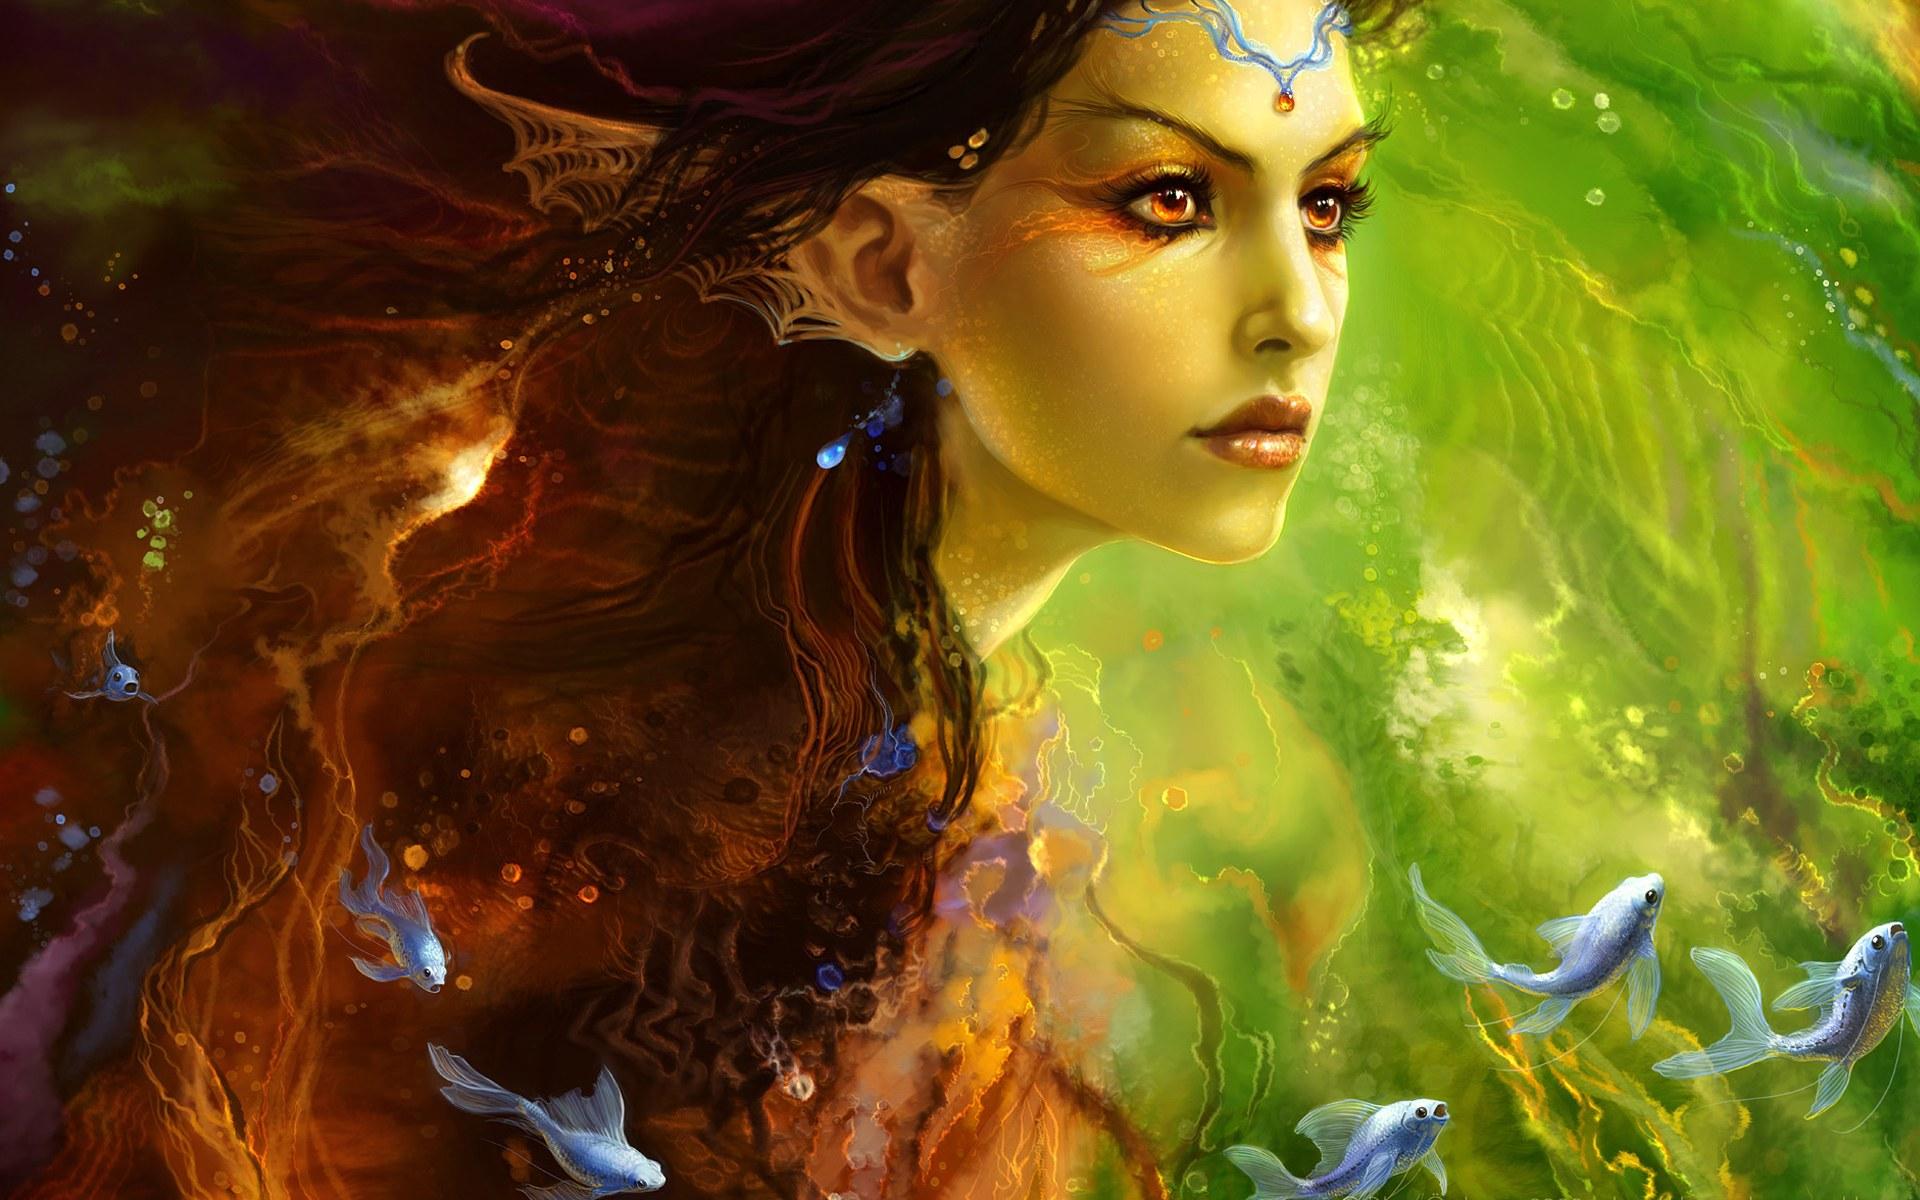 Fantasy Girl Siren Princess Wallpapers 1920x1200